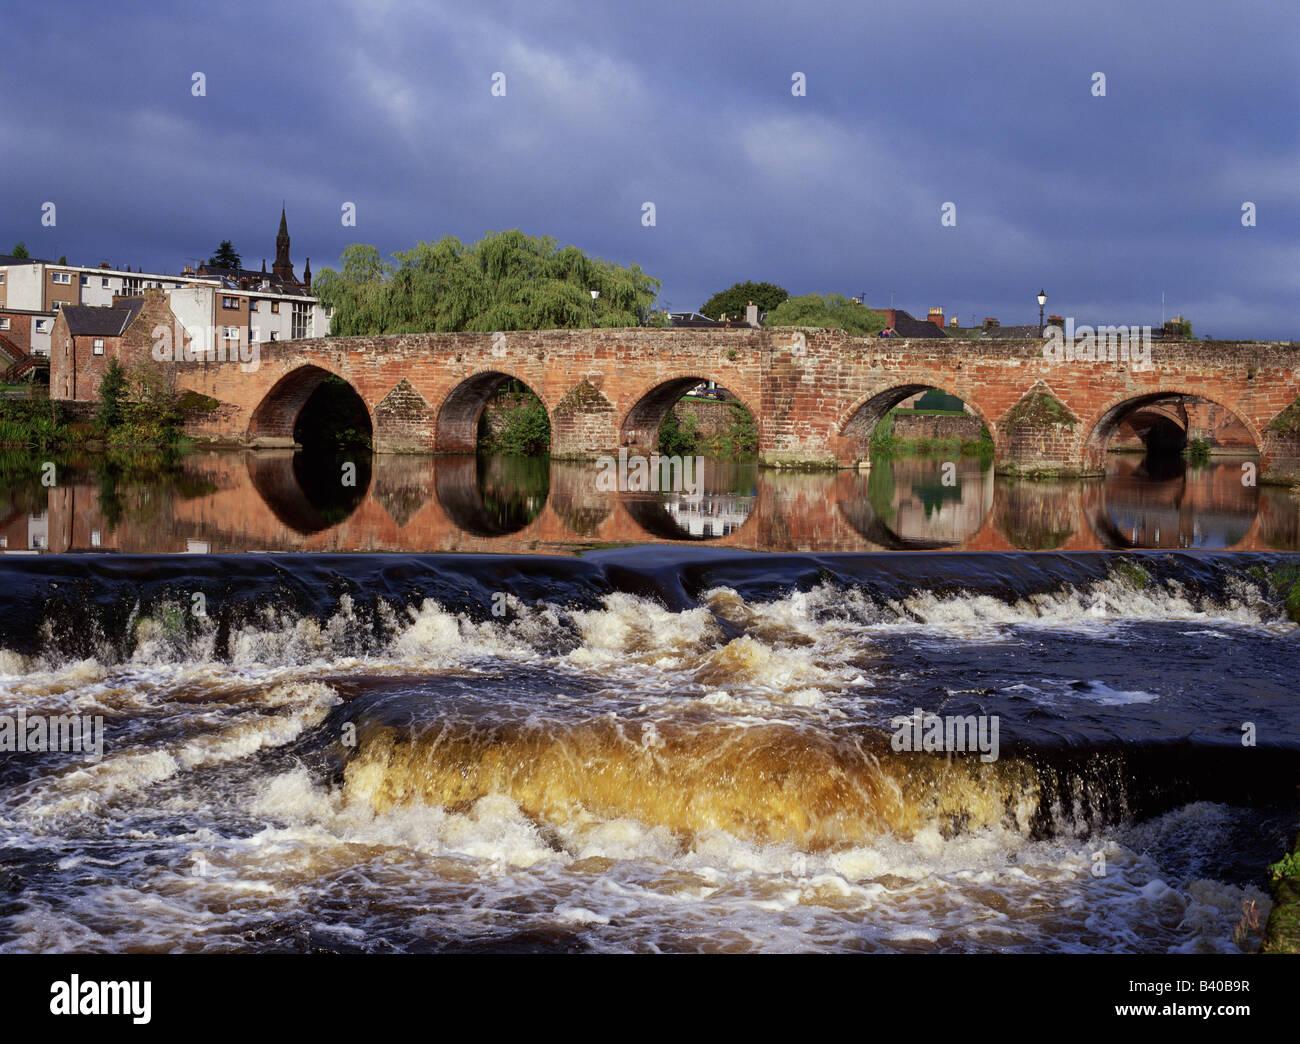 dh Devorgilla bridge River Nith DUMFRIES GALLOWAY Scottish Devorgillas old Multiple stone arch bridges scotland rivers Stock Photo